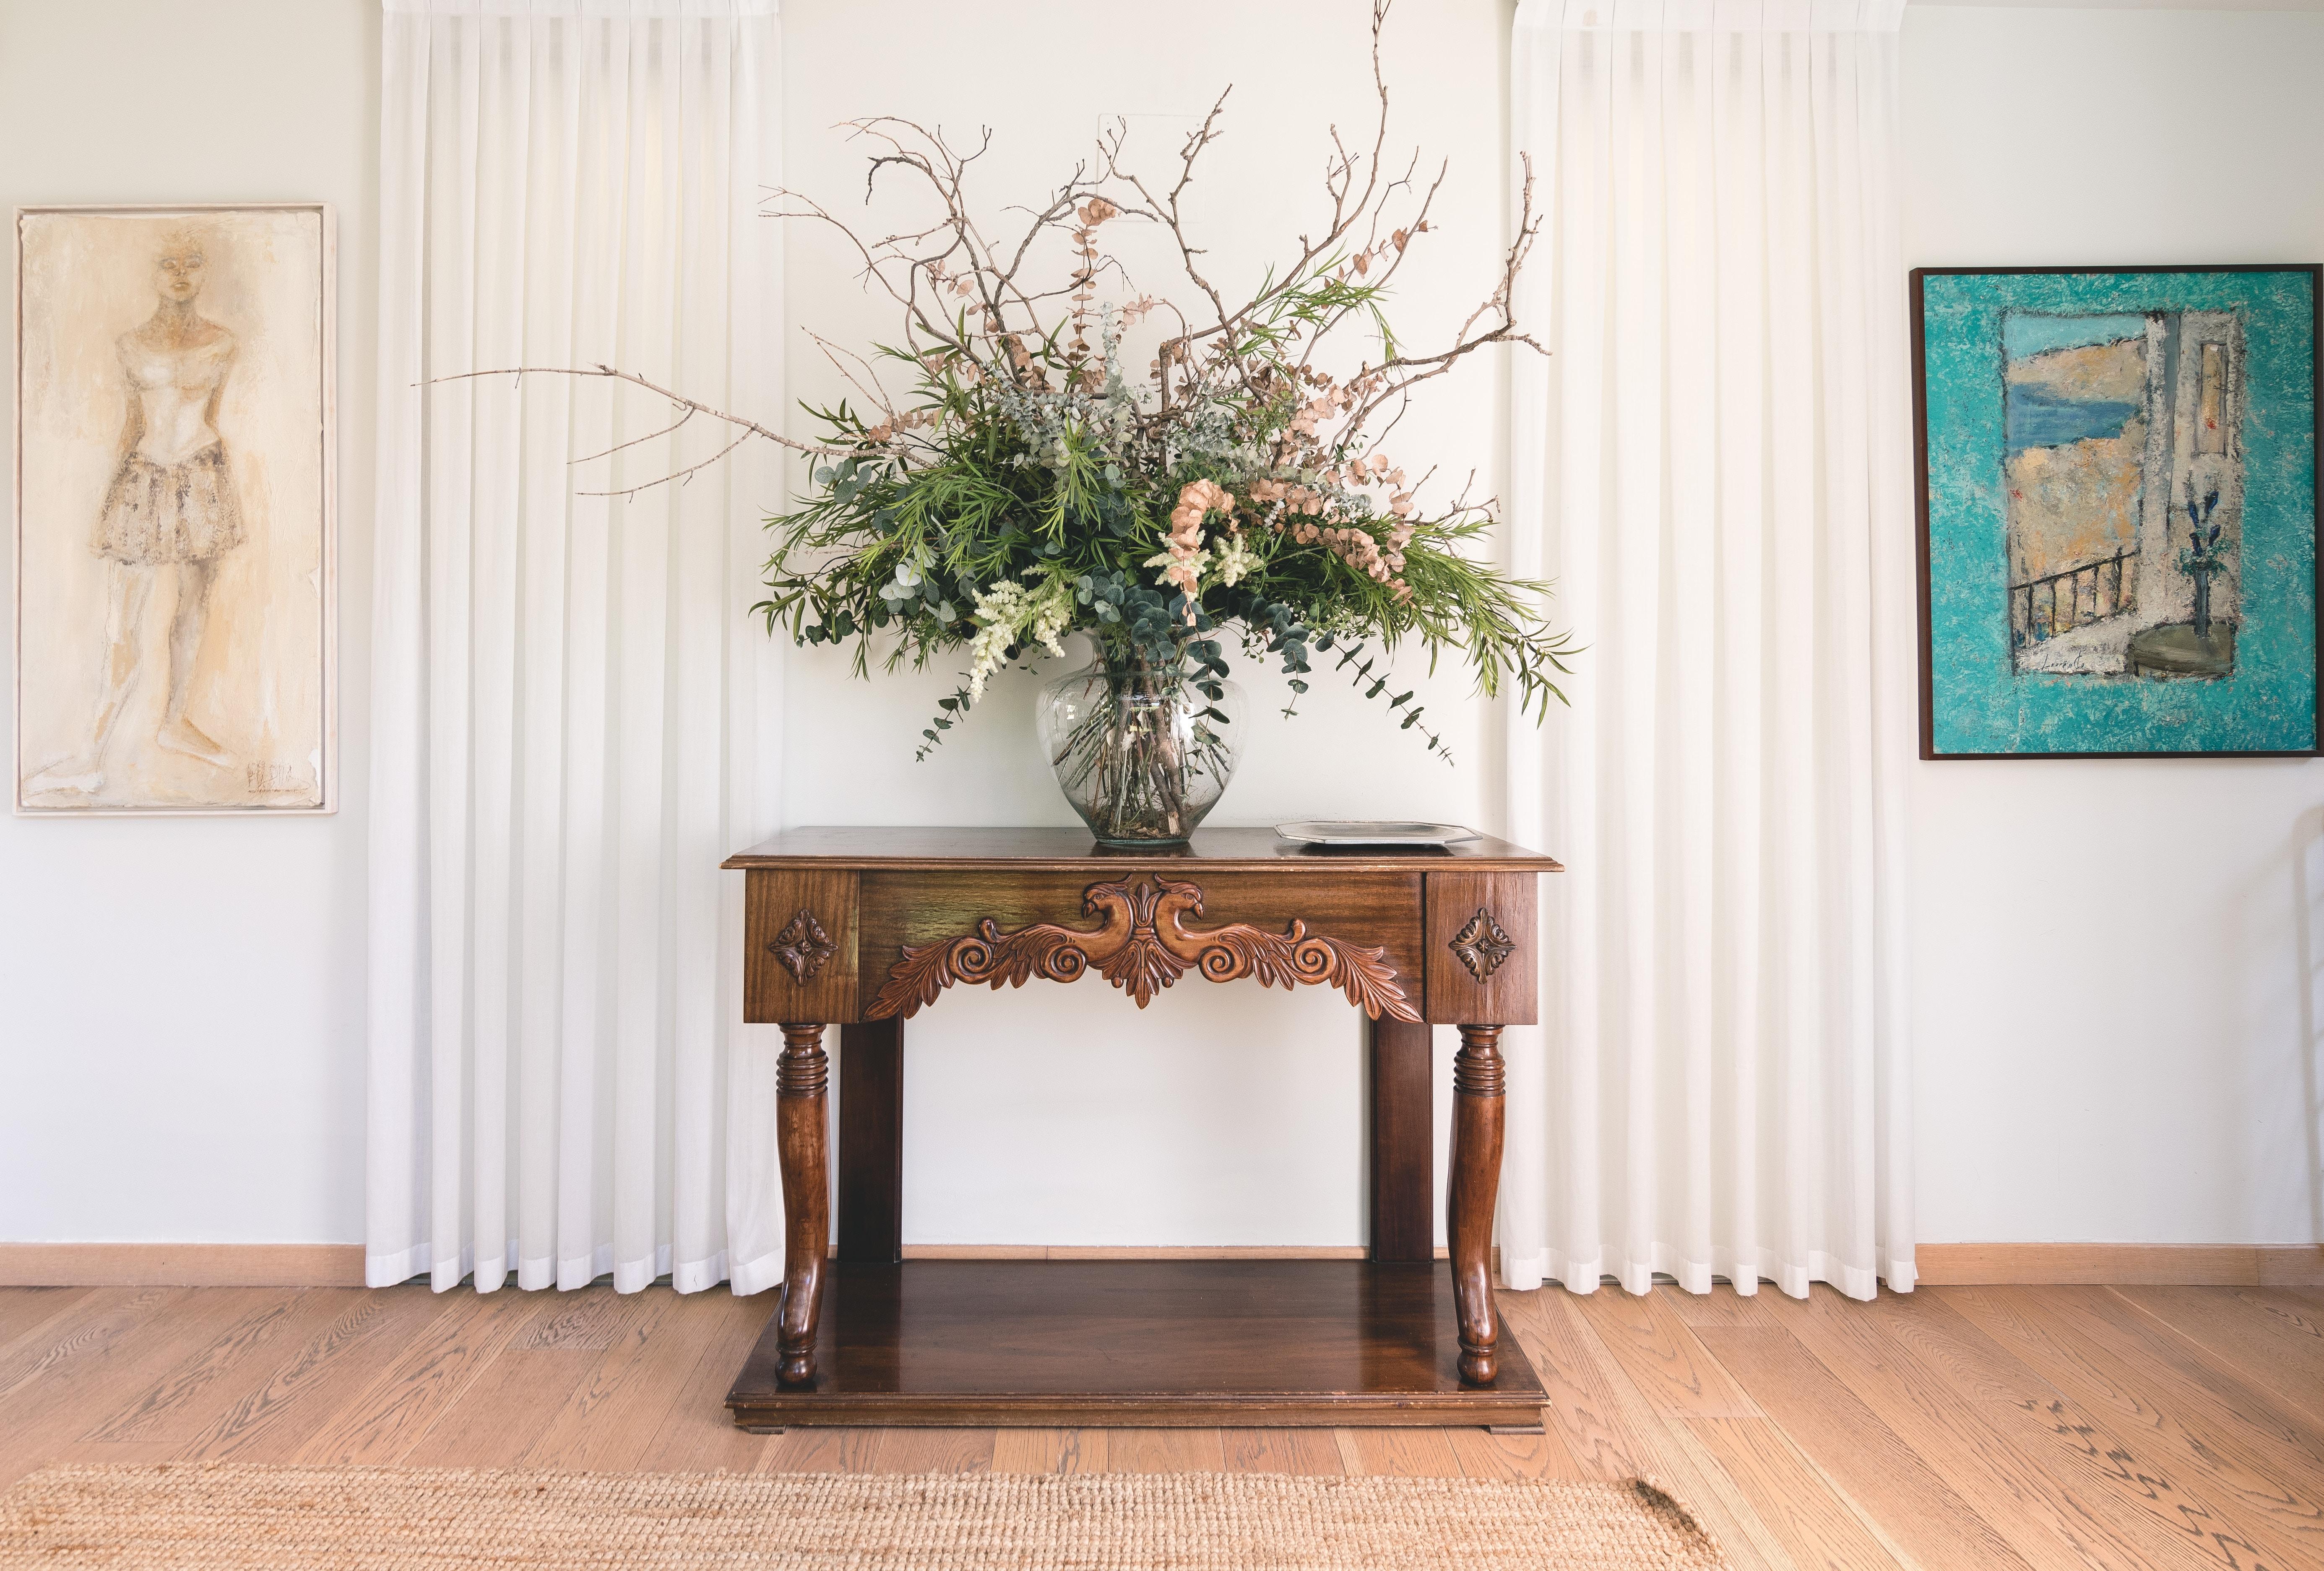 green leafed plant on vase near wall